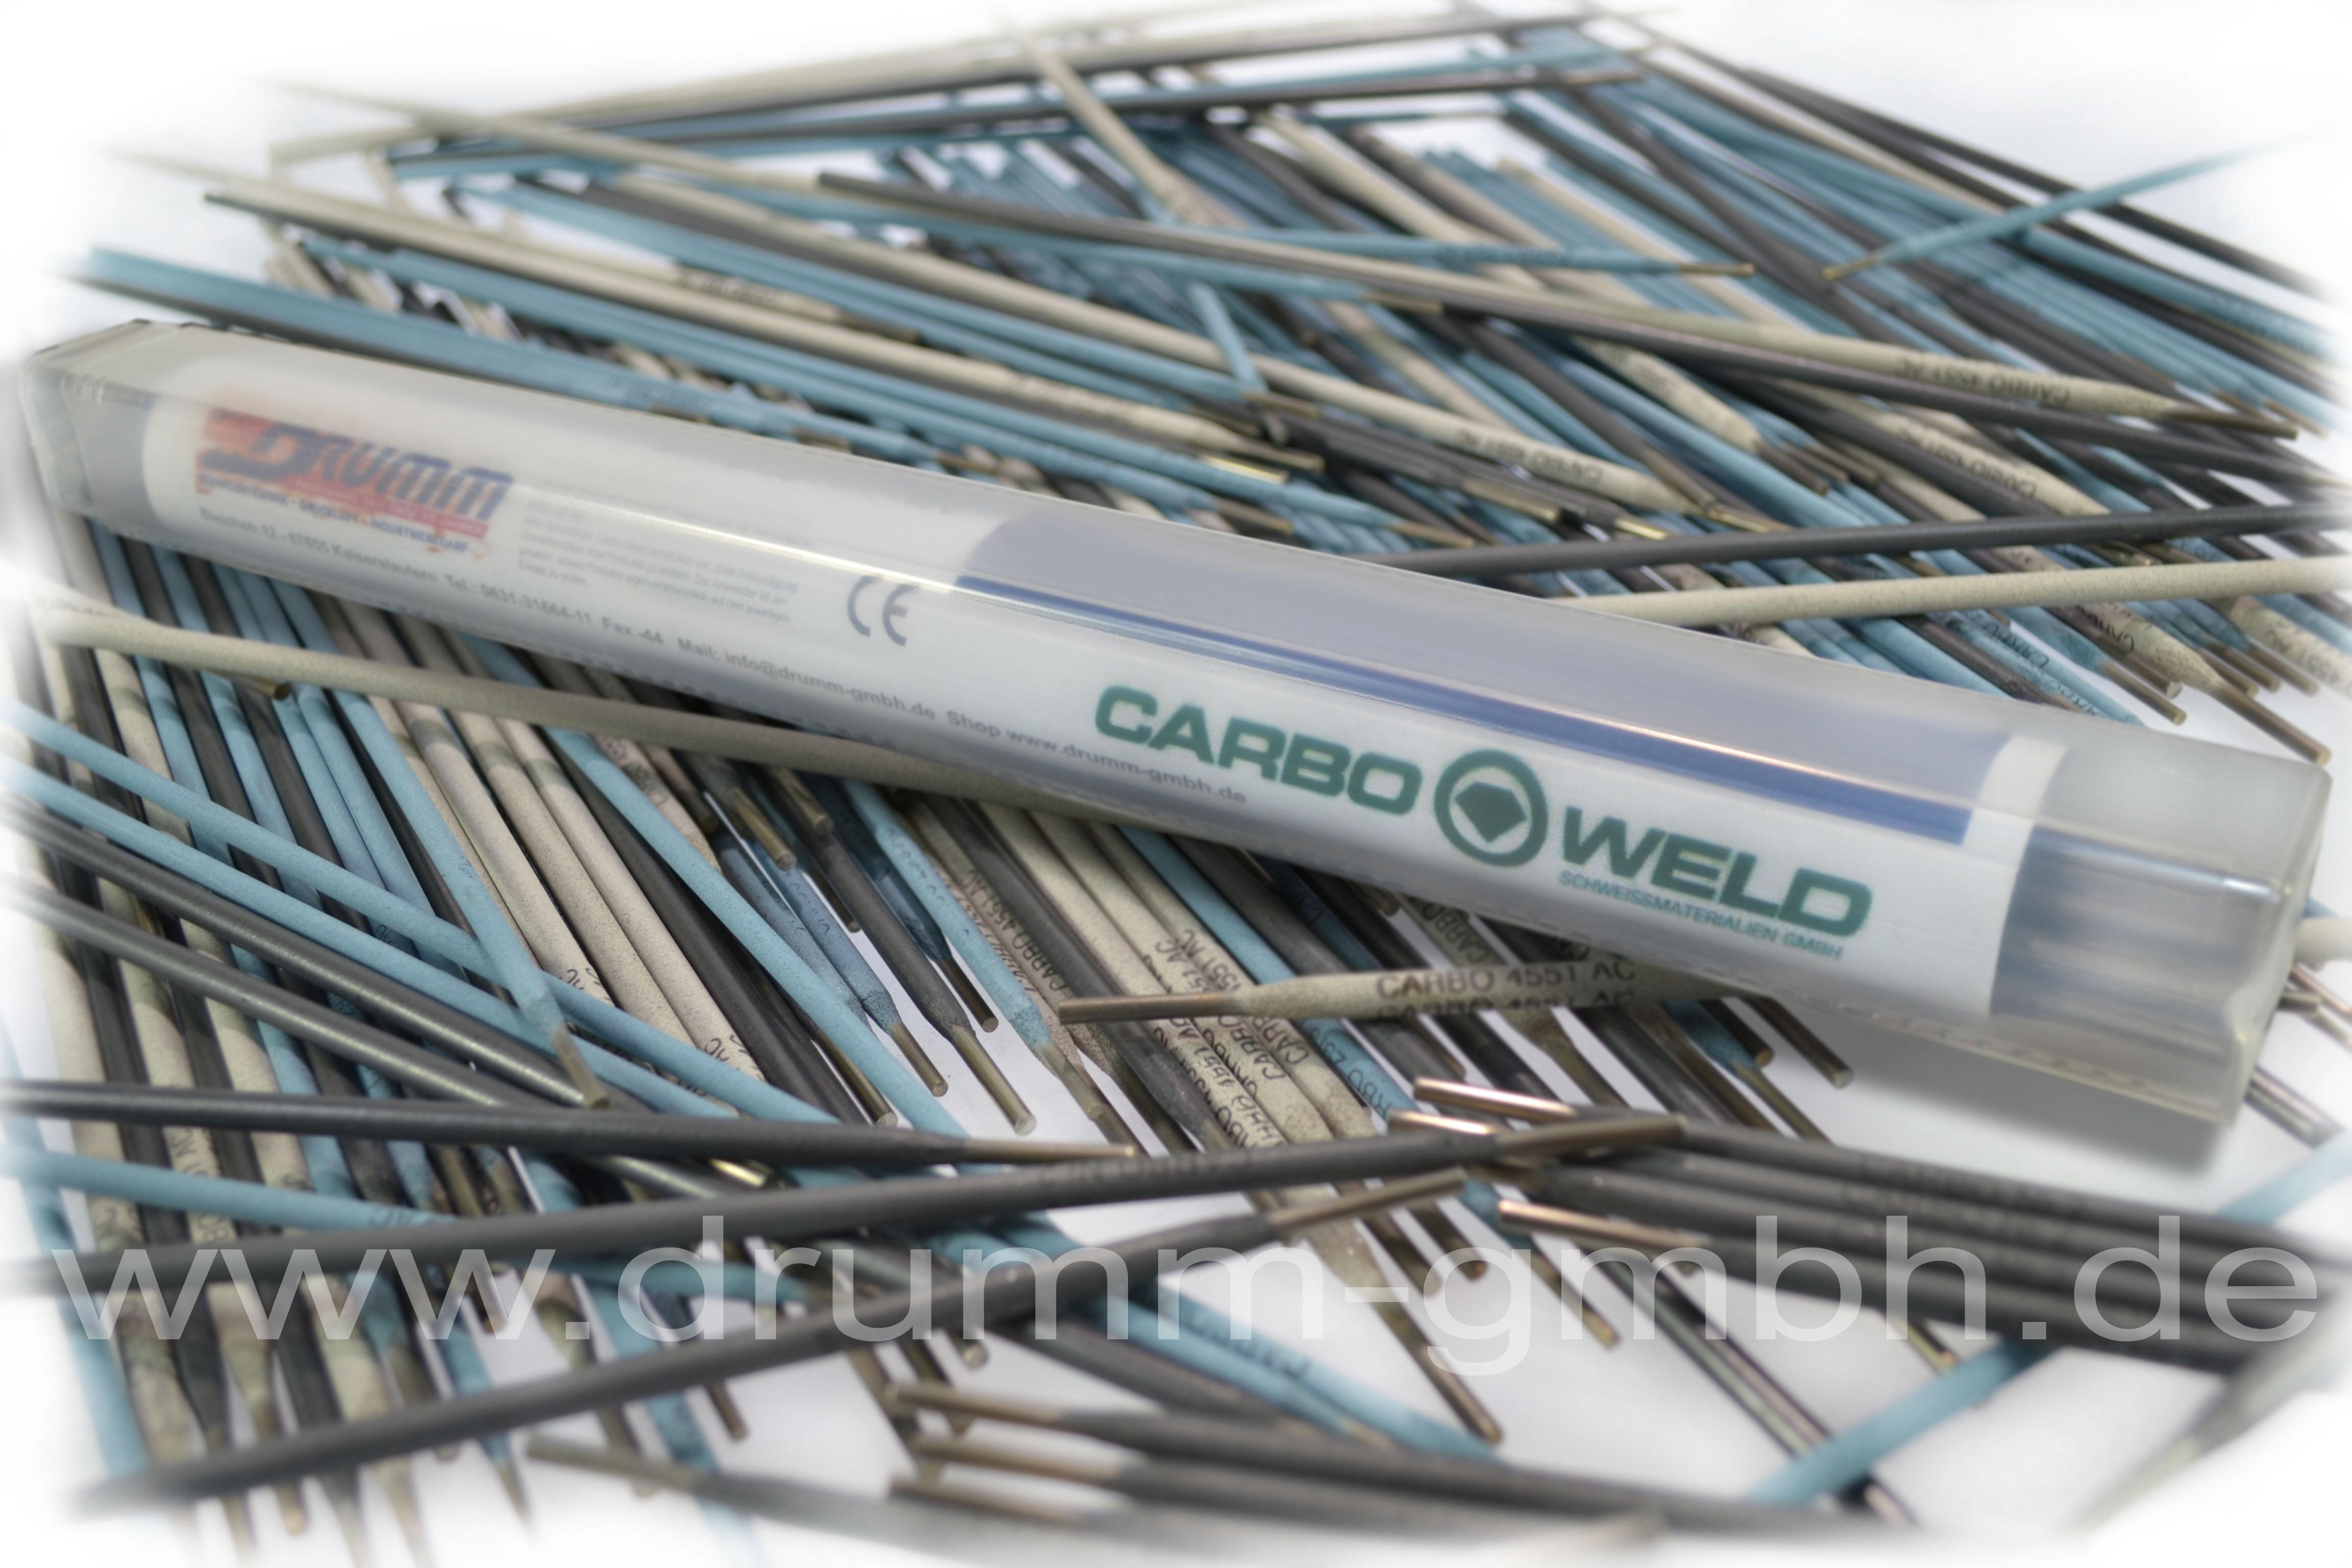 Stabelektroden Carbo Weld CARBO Ni 2, Maße 3,2 x 350 mm, 10 Stück